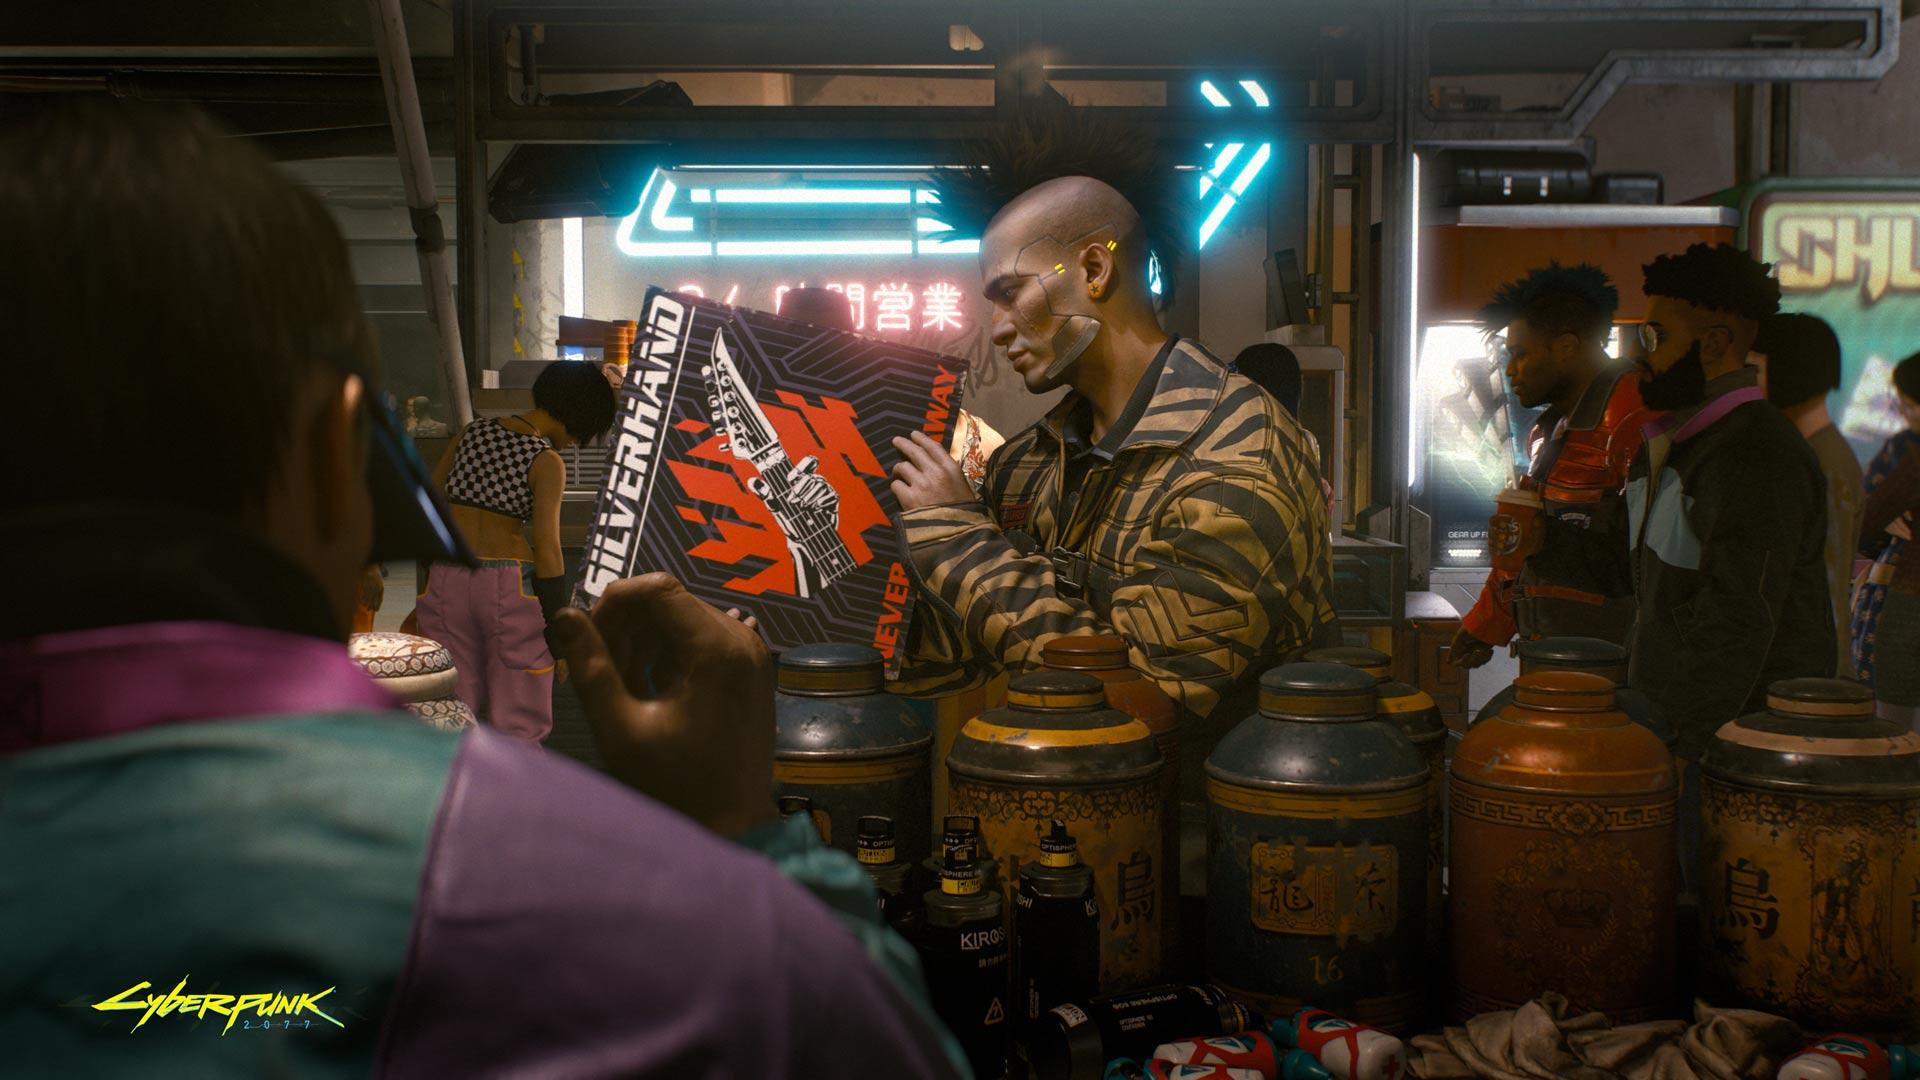 Cyberpunk 2077 Gotta know where to look